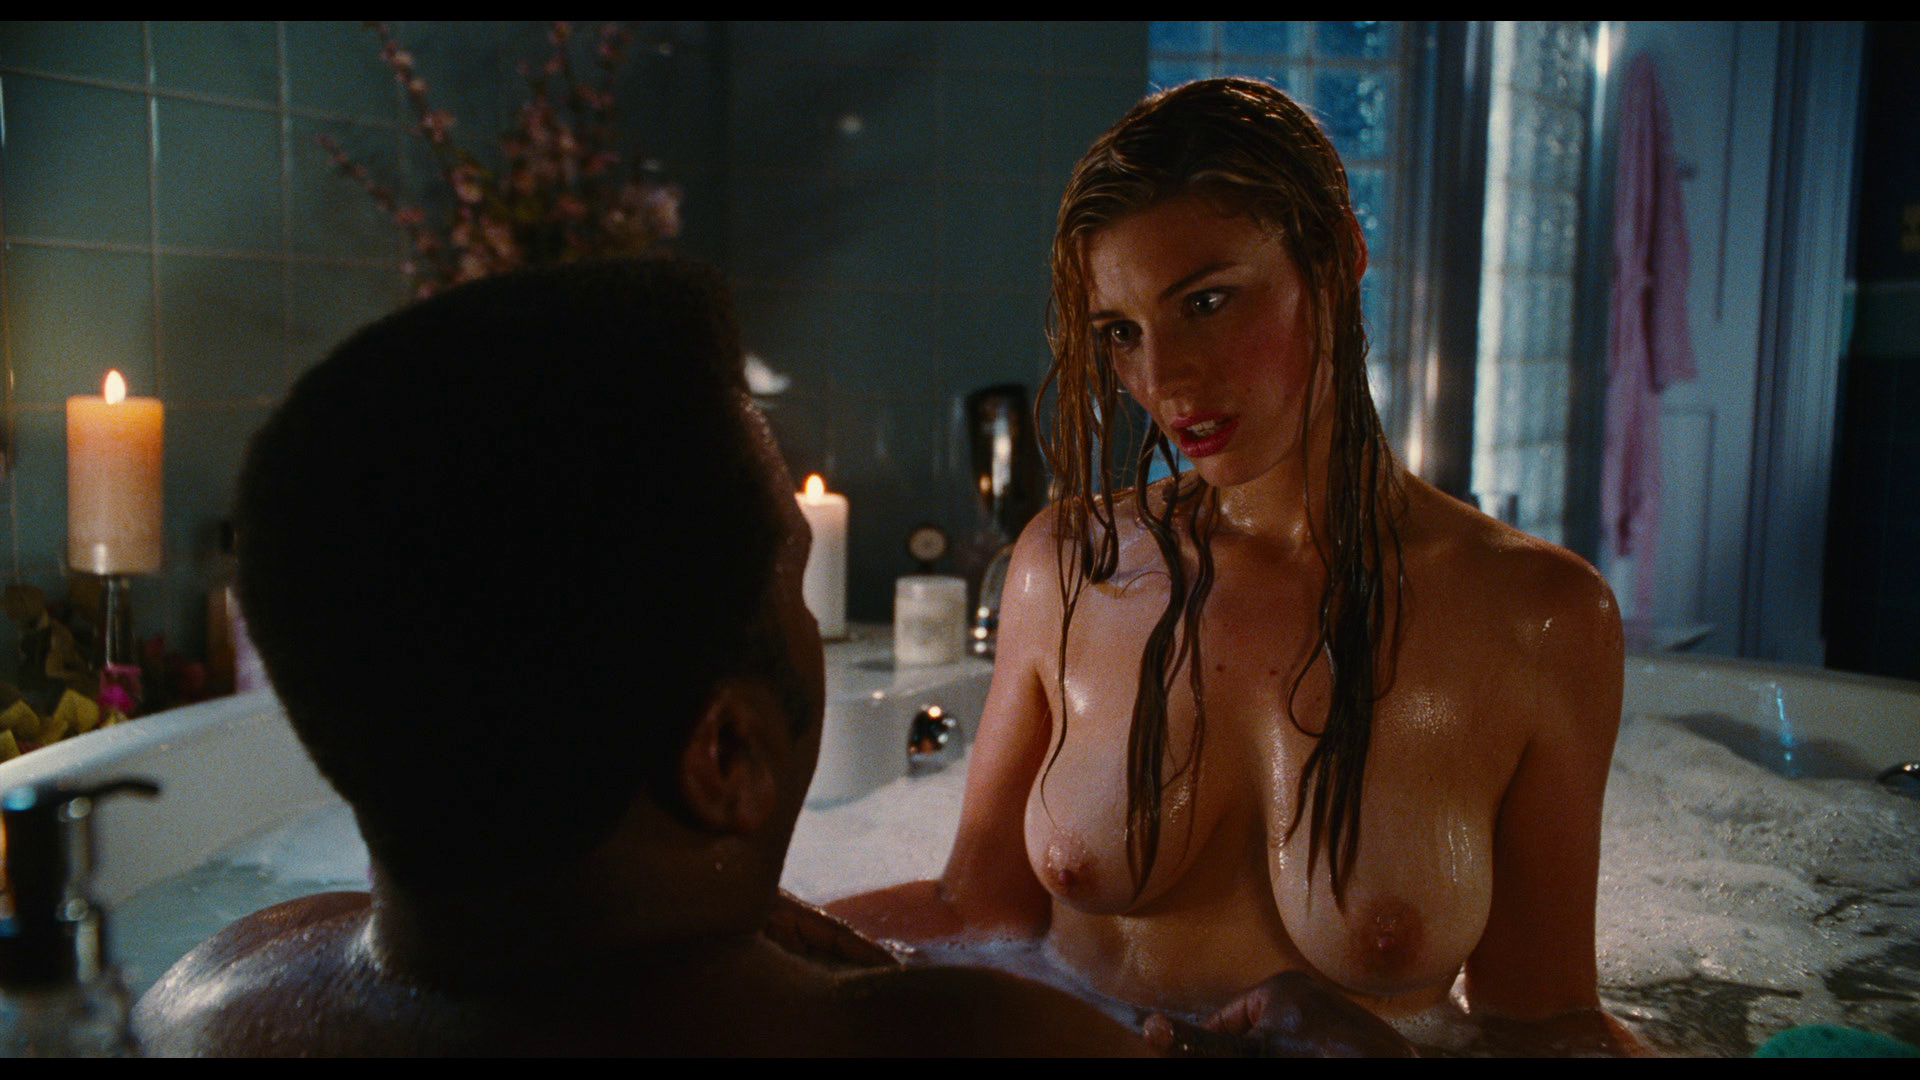 Hot nude film pornos video